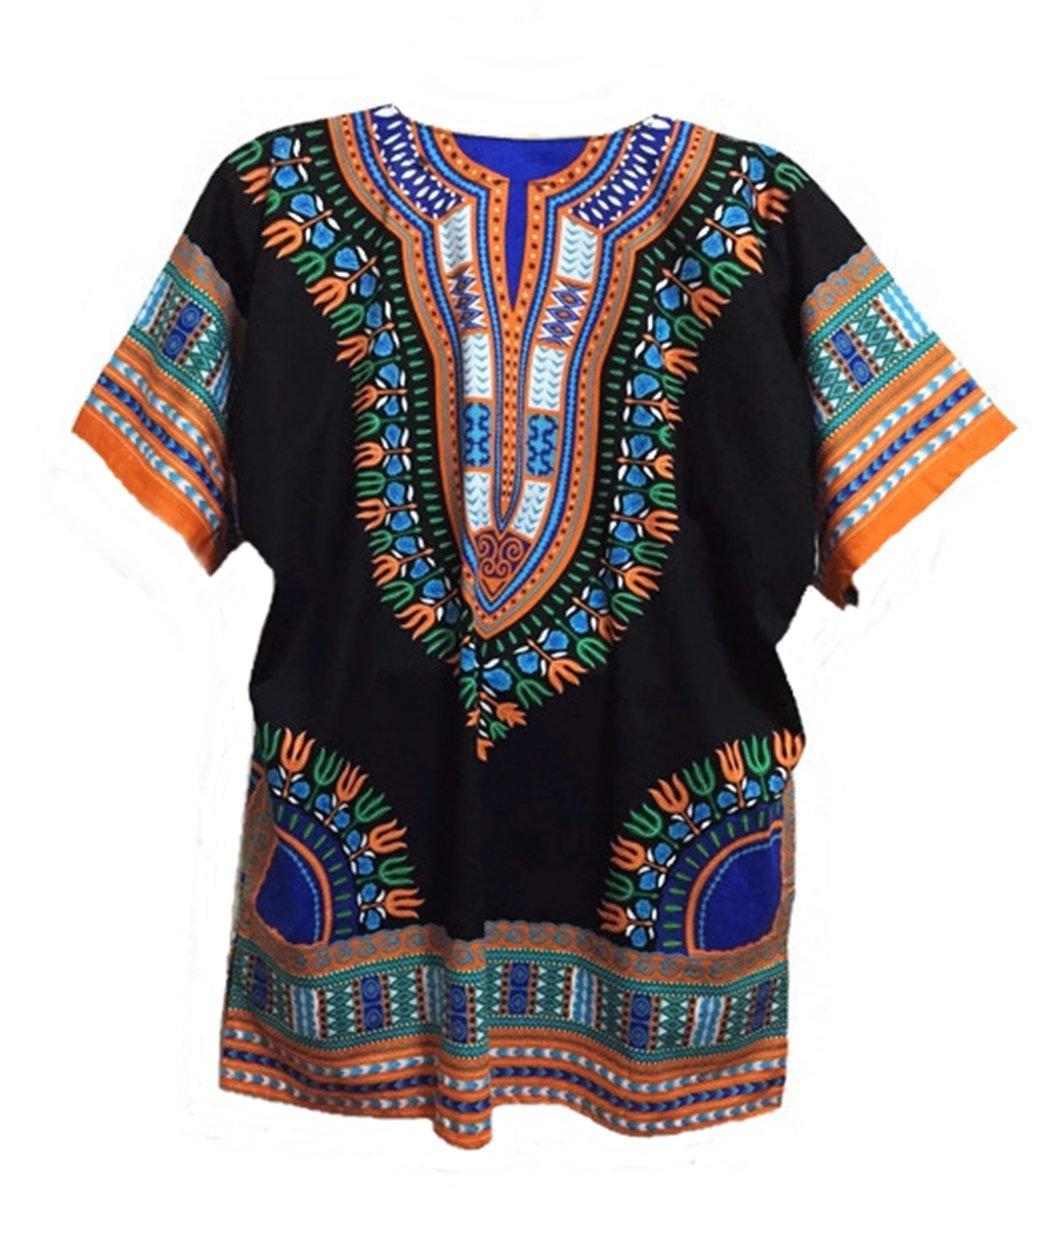 Vipada Handmade Men Dashiki Shirt African Caftan Black with Orange XXXXL by Vipada Handmade (Image #2)